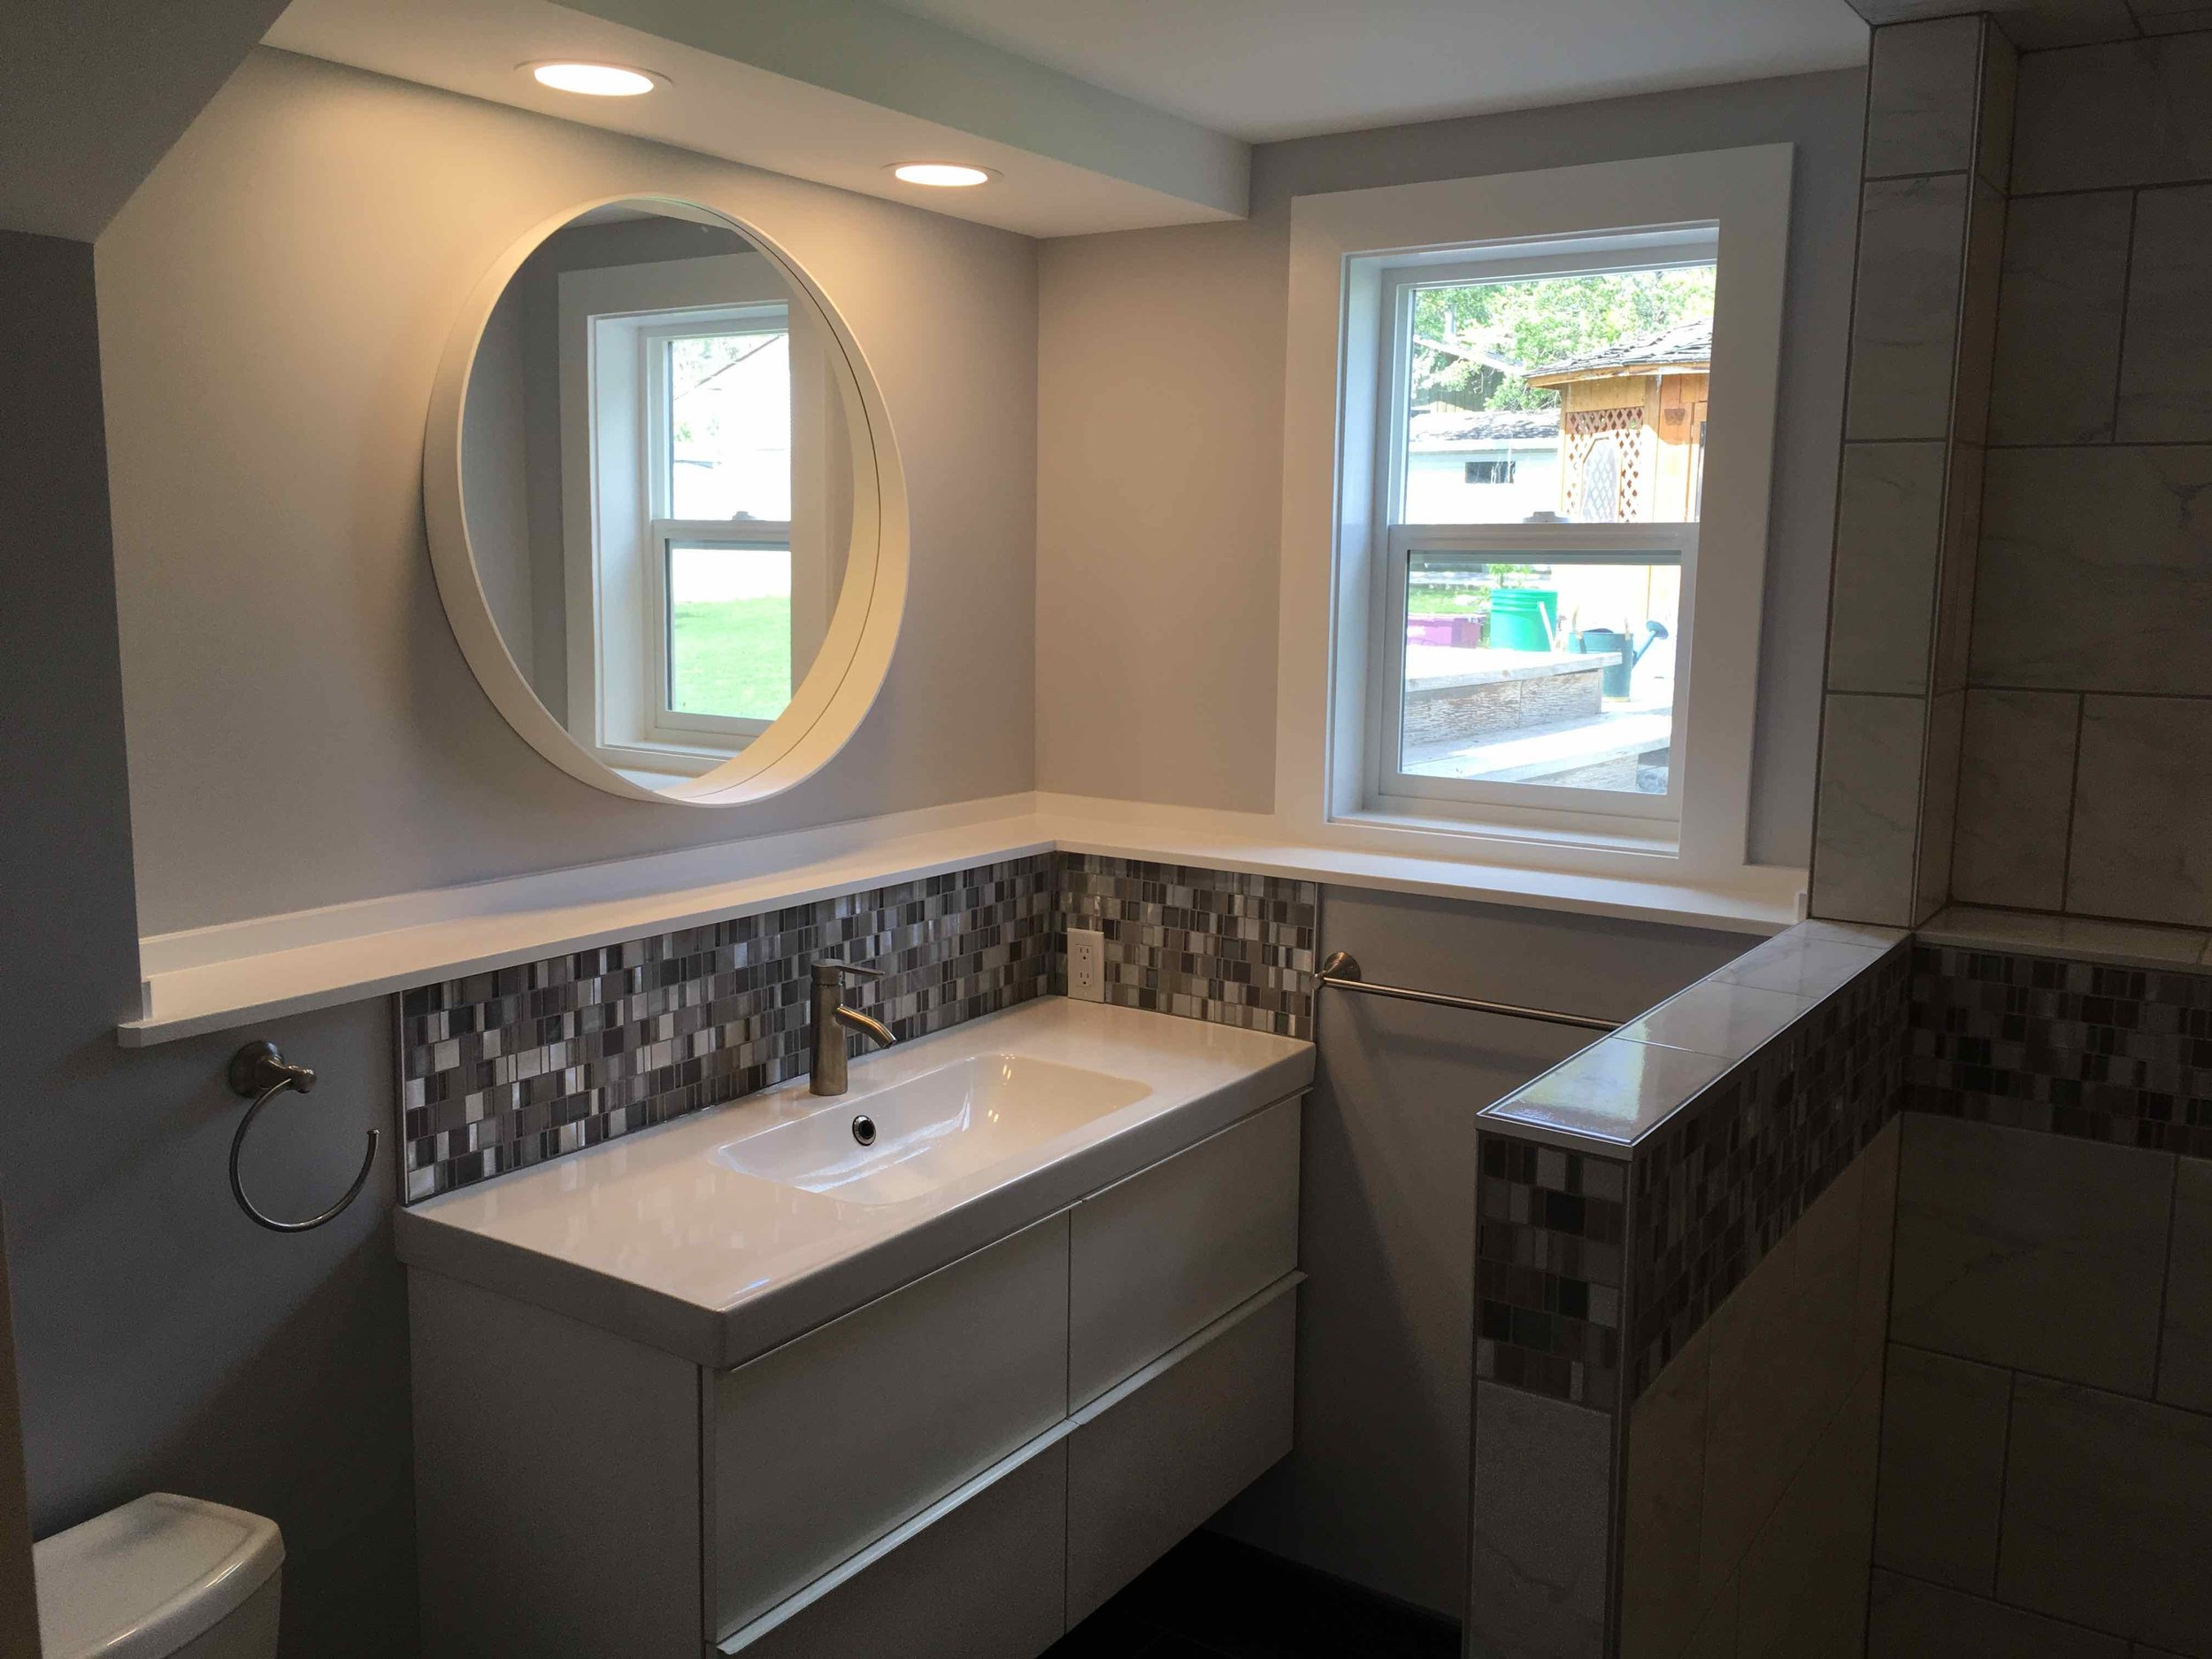 bathroom-renovation-after-10.jpg